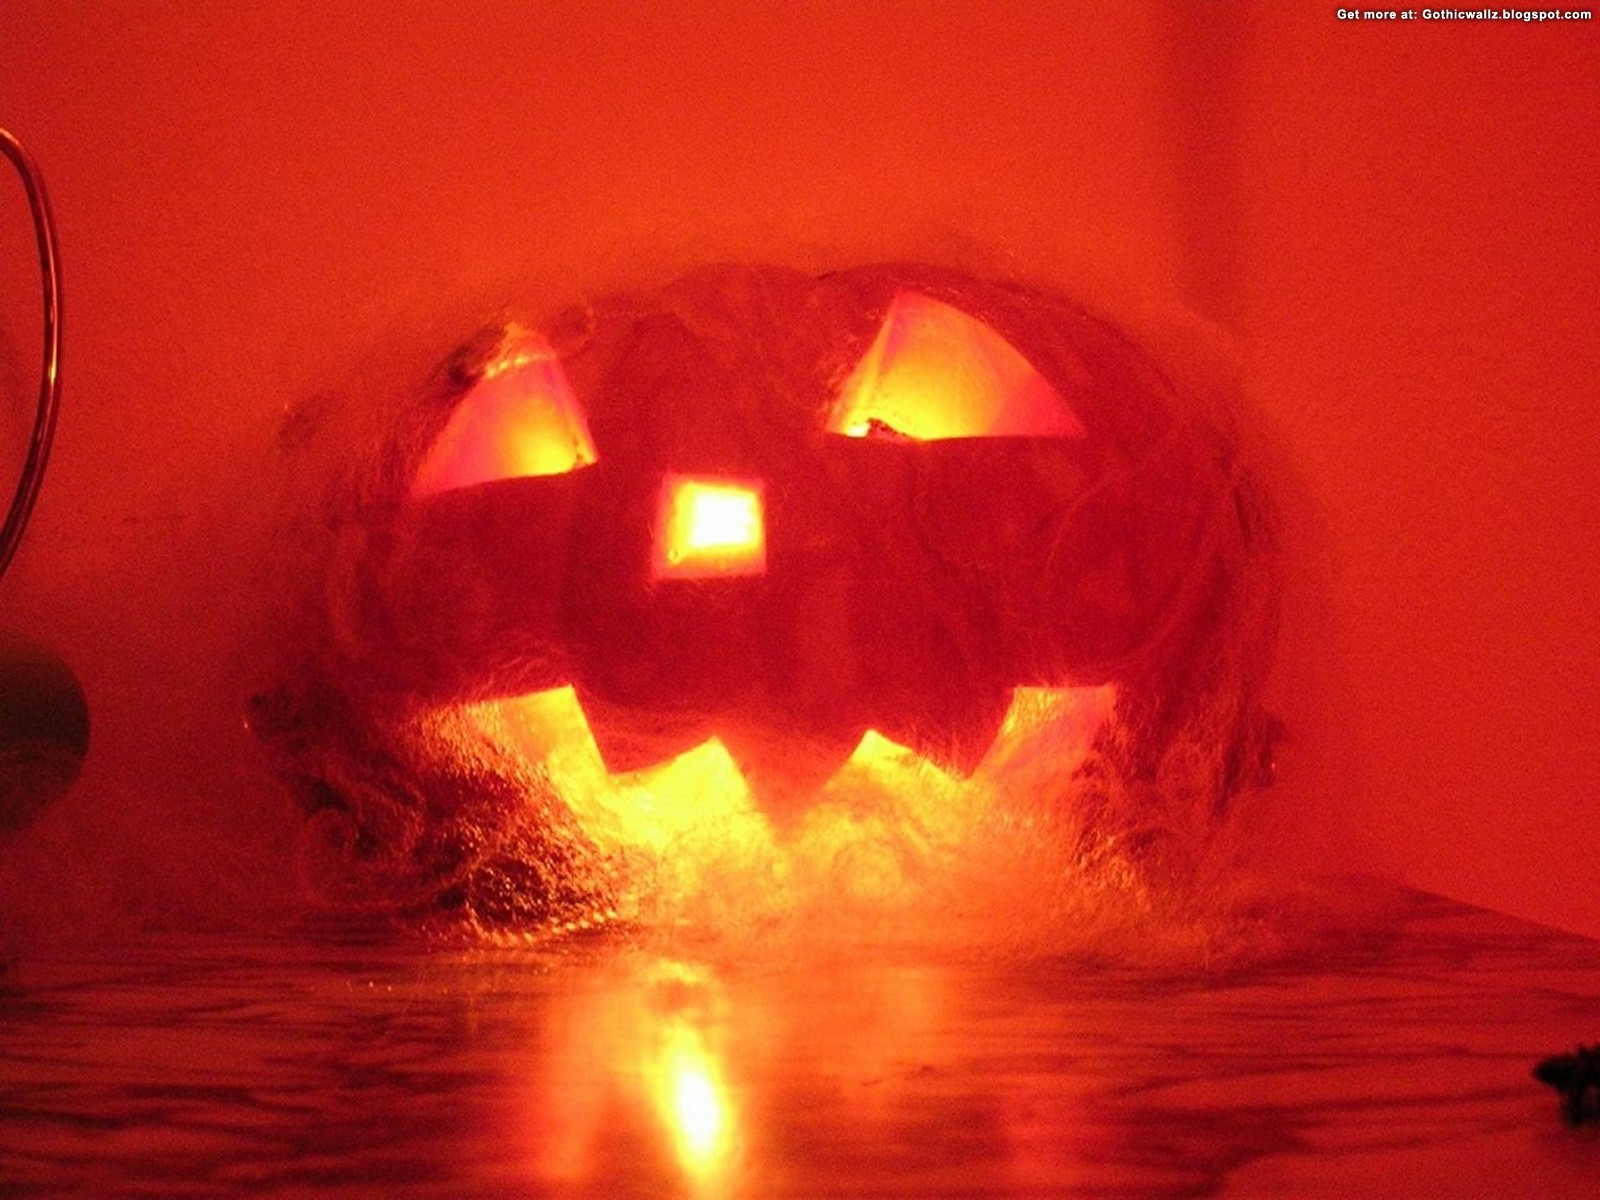 http://4.bp.blogspot.com/_-jo2ZCYhKaY/TM27DyN9pTI/AAAAAAAAIYE/iaORvHujGnY/s1600/hell-pumpkin+(gothicwallz.blogspot.com).jpg